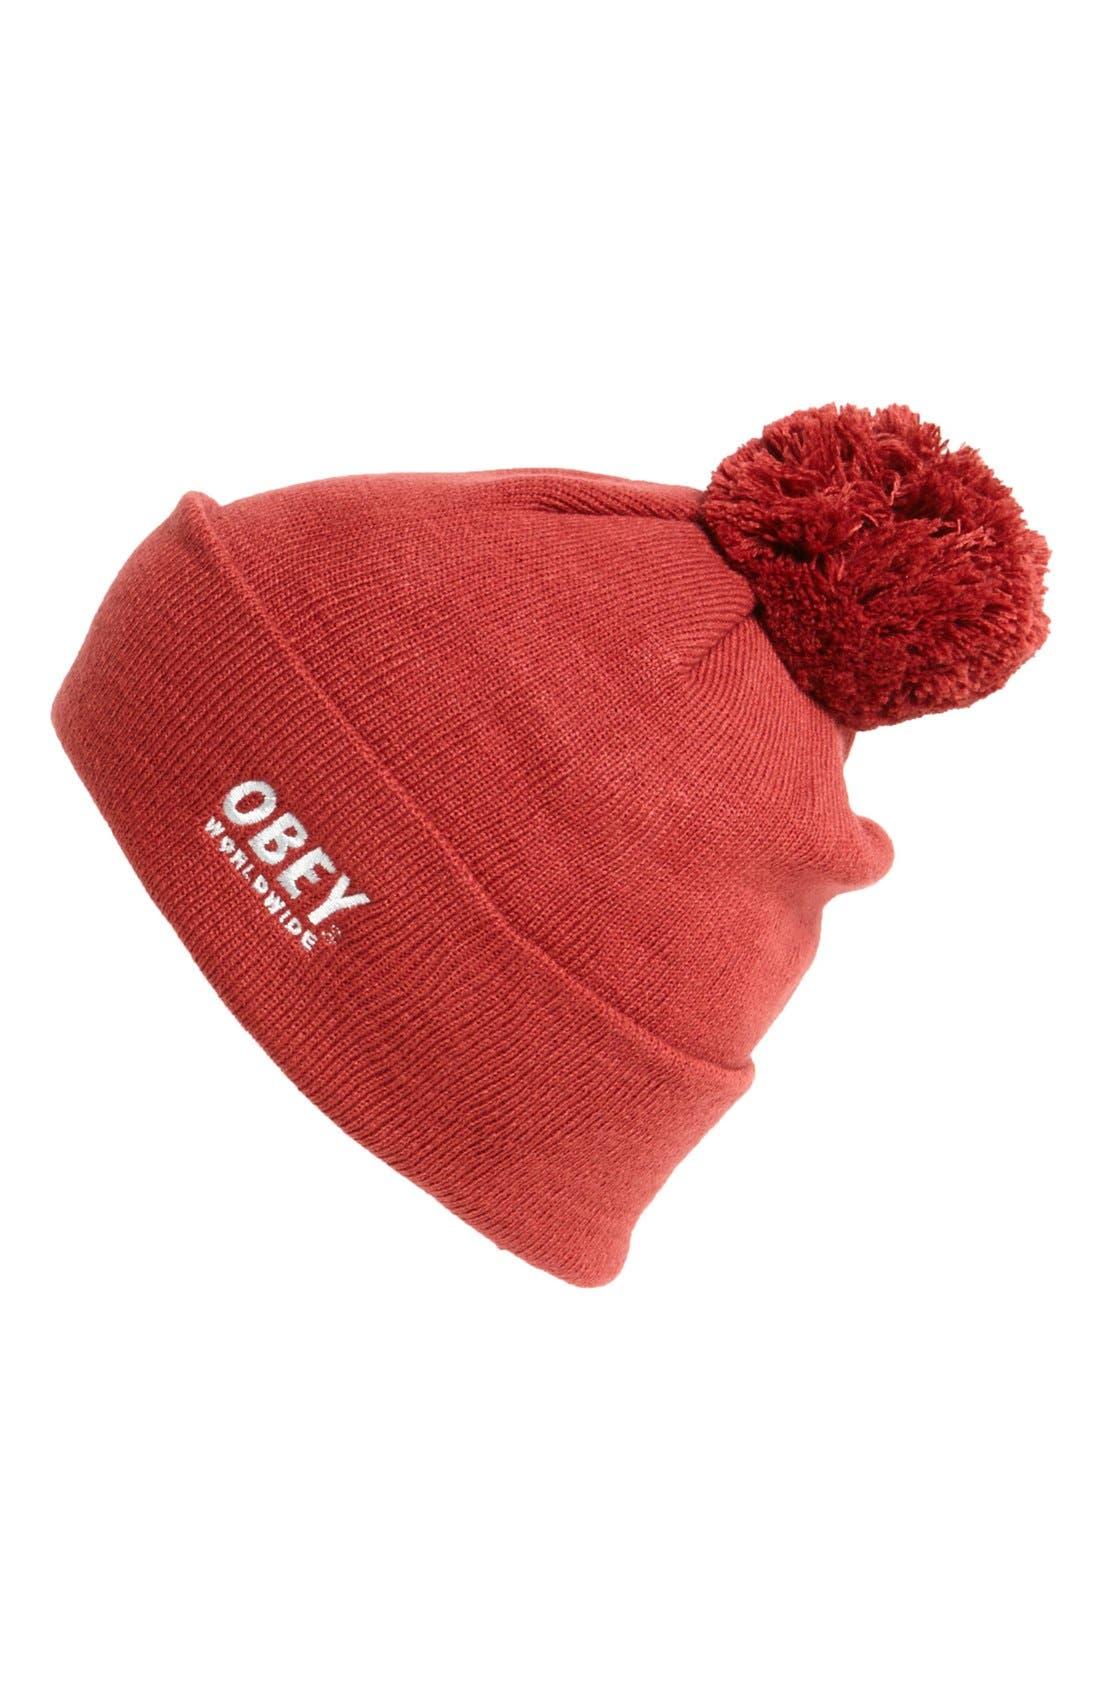 Alternate Image 1 Selected - Obey 'Worldwide' Pompom Knit Cap